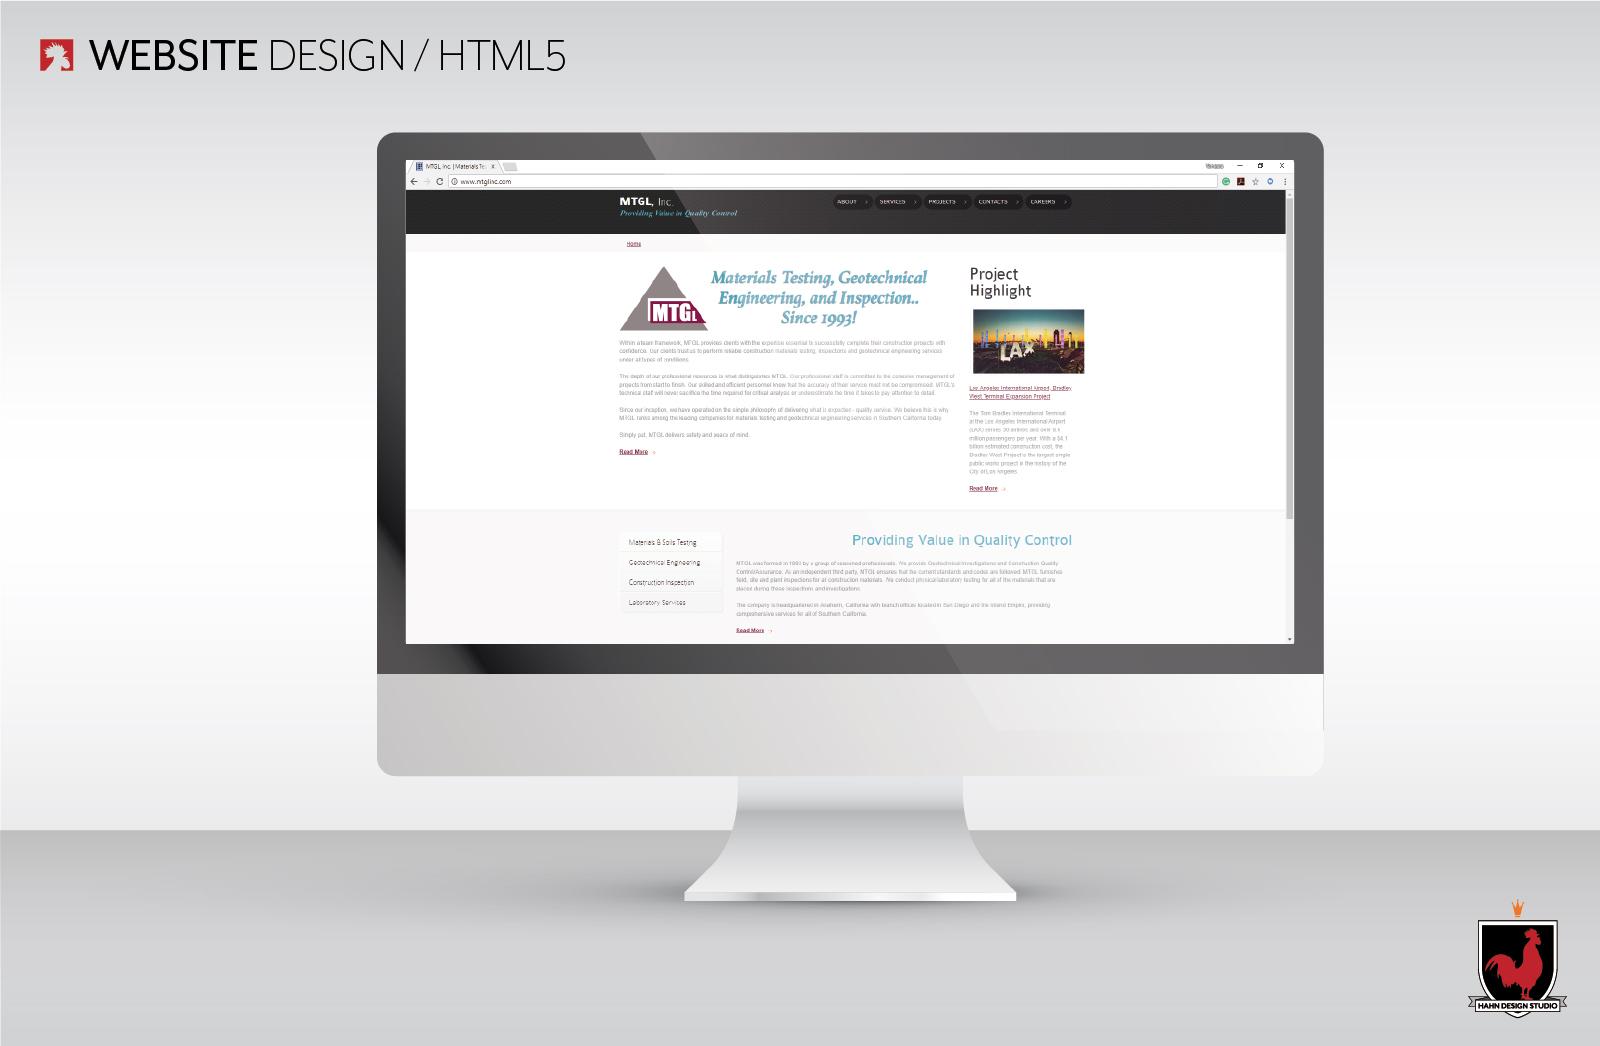 Website Design, HTML5 | MTGL, Inc., Hahn Design Studio, San Marcos, California